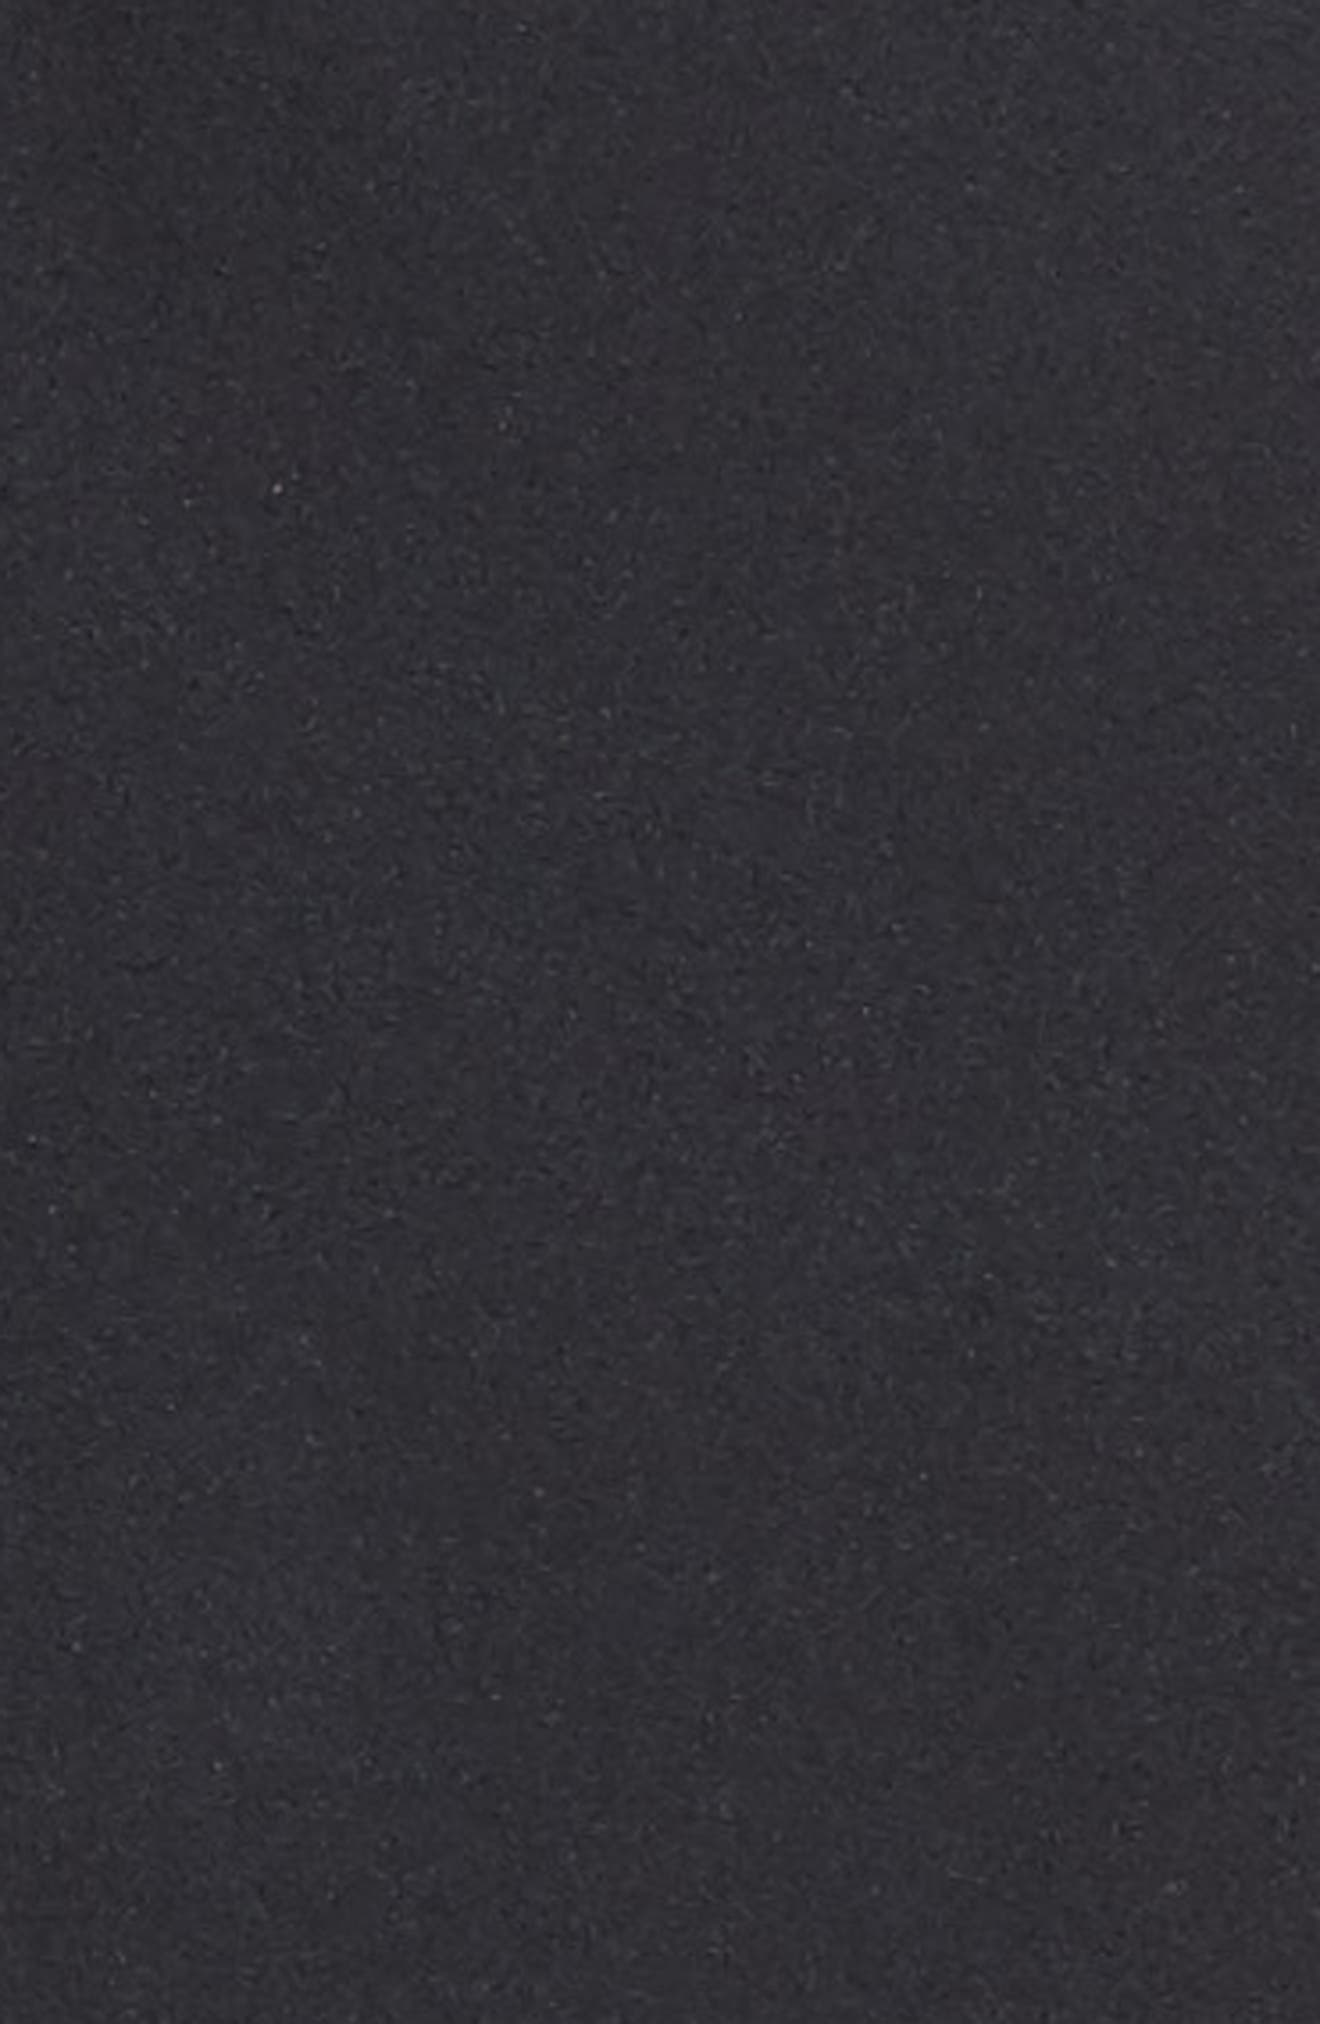 Launch Tulip Running Shorts,                             Alternate thumbnail 6, color,                             Black/ Black/ Reflective